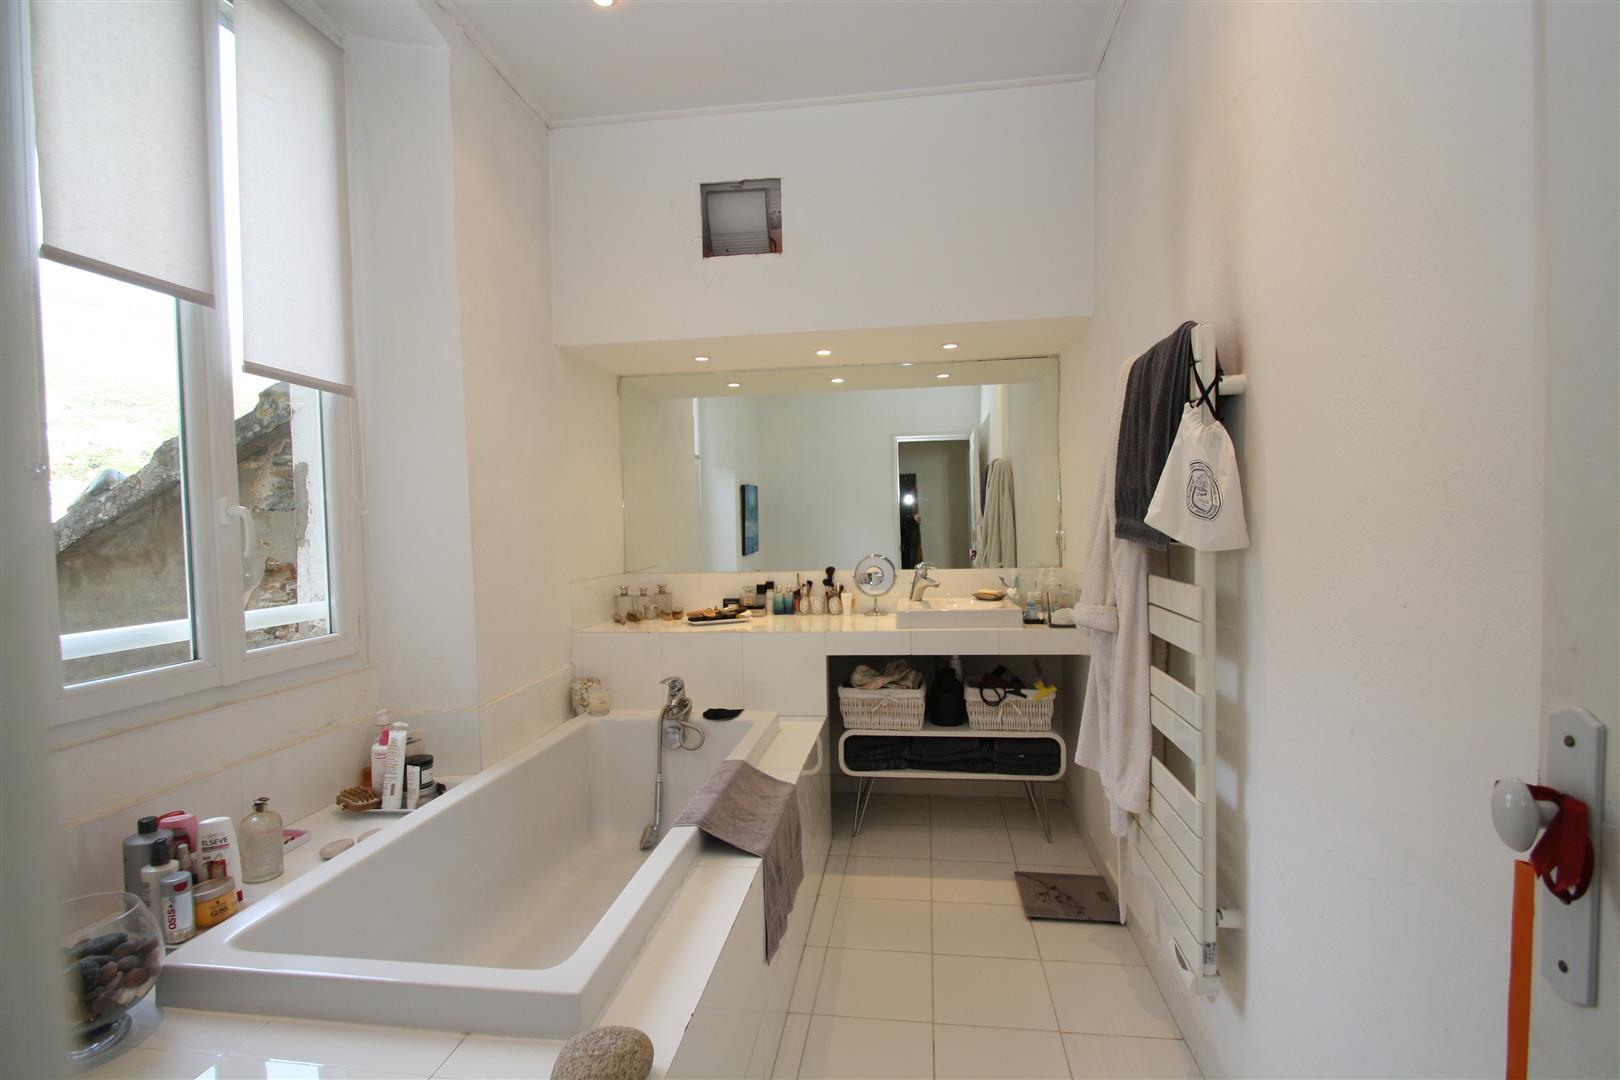 brando appartement renove agence immobili re bastia avec localisimmo agence immobili re. Black Bedroom Furniture Sets. Home Design Ideas